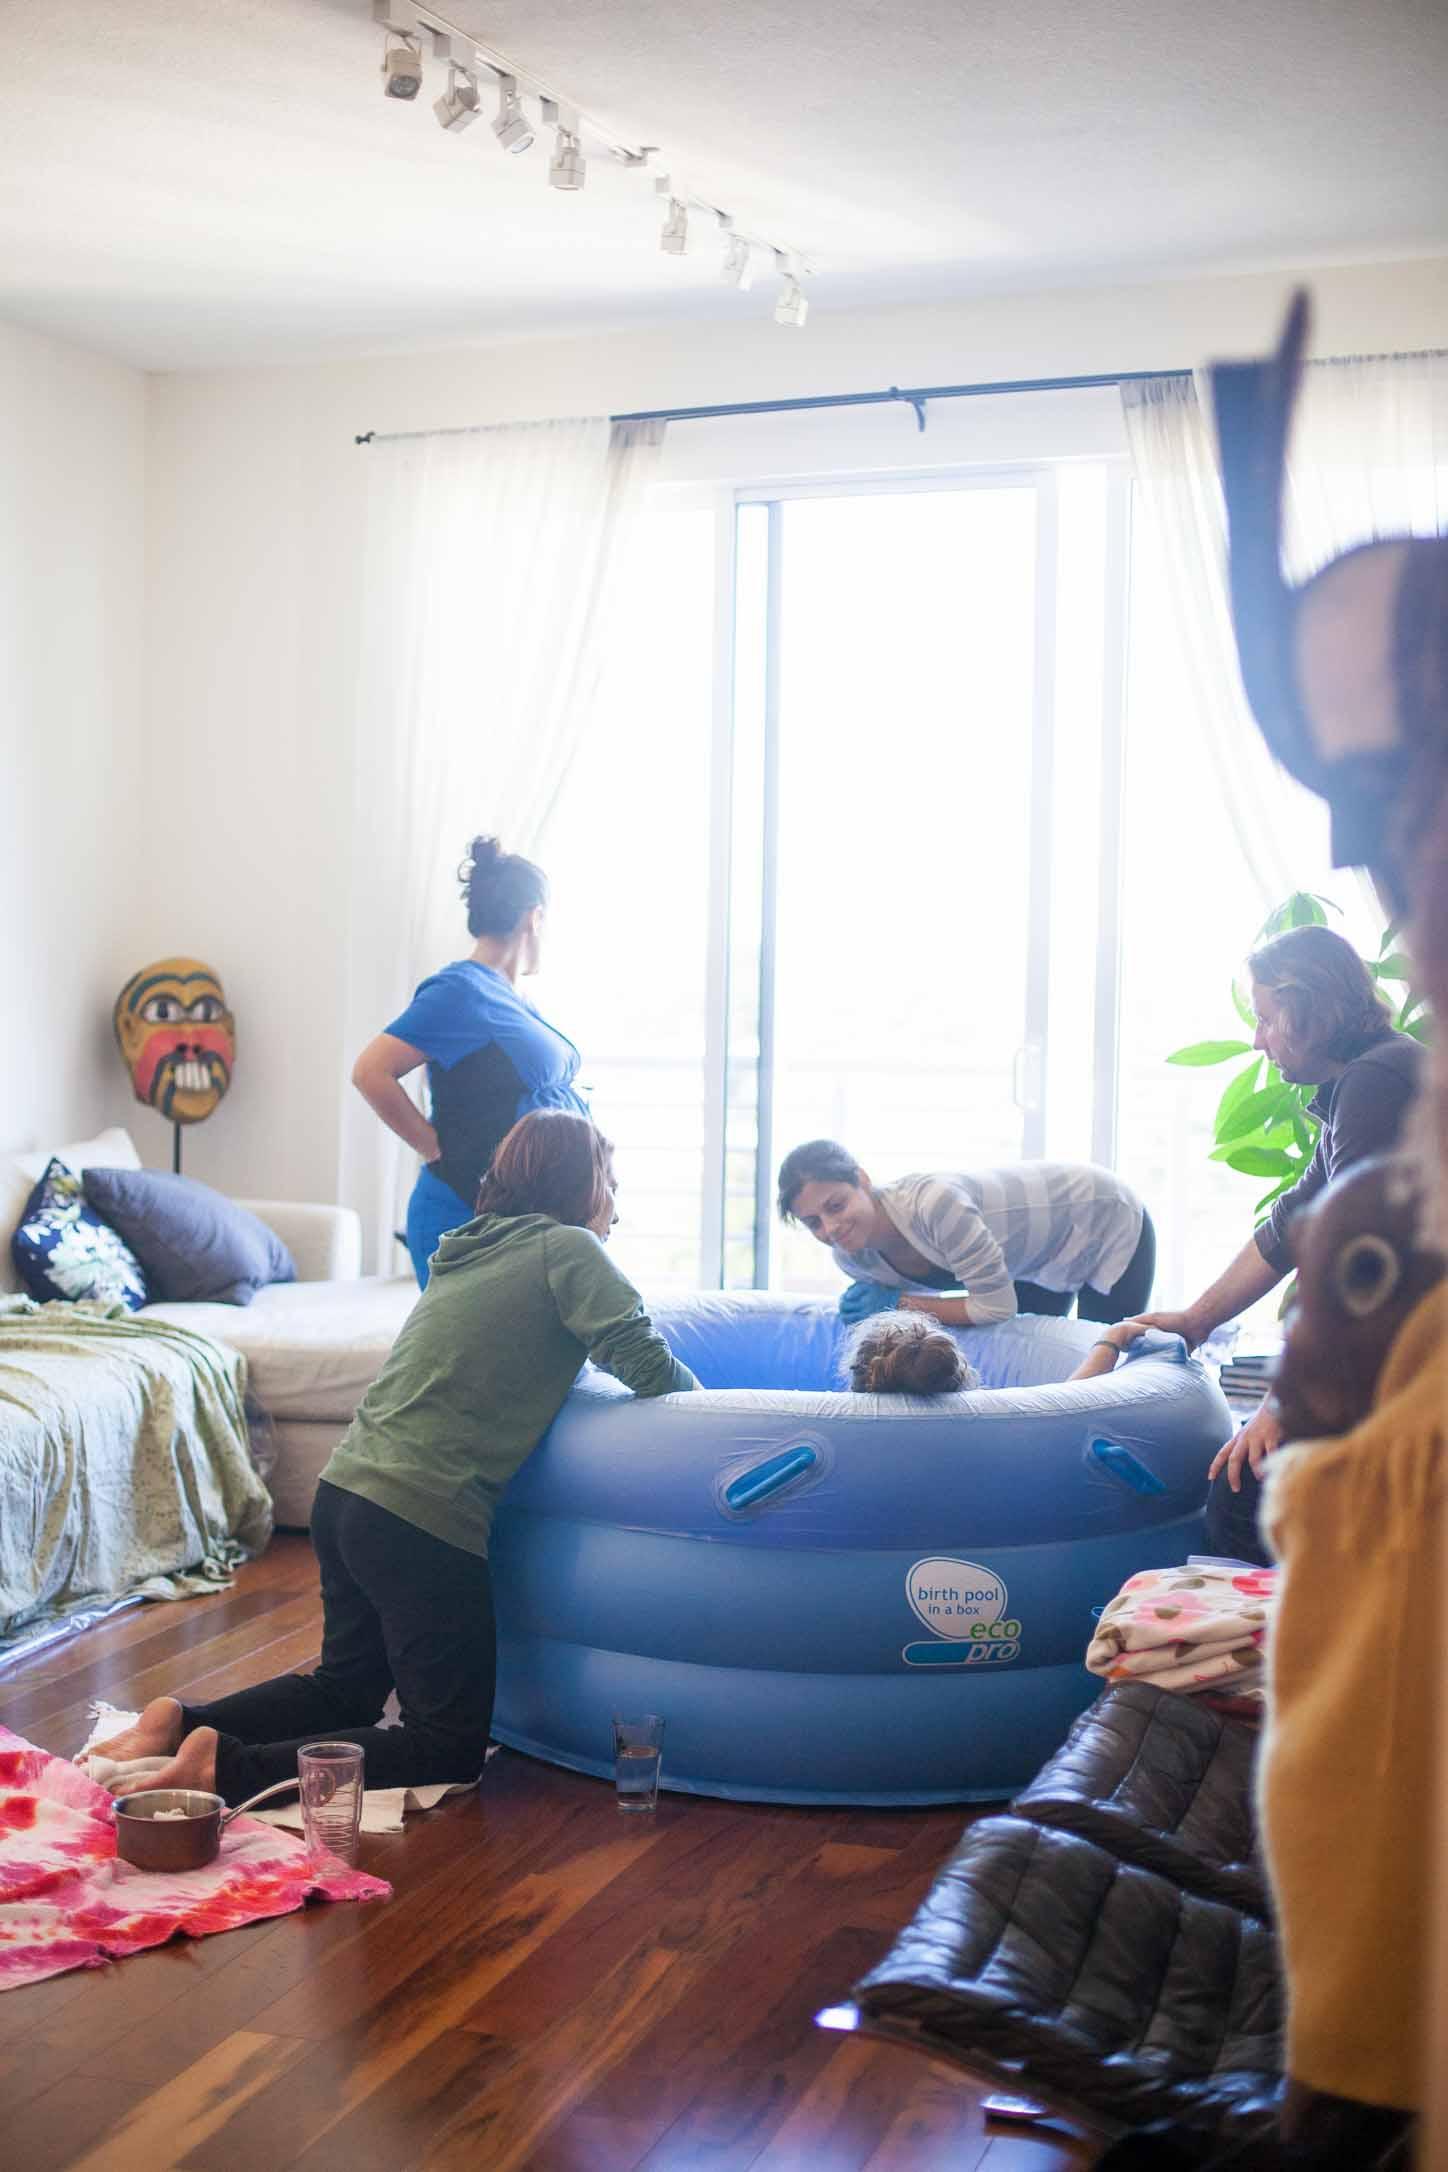 birth-photographer-boca-photography-near-me-birth-center-delray-beach-hollywood-breastfeeding-doula-midwife-childbirth-9.jpg